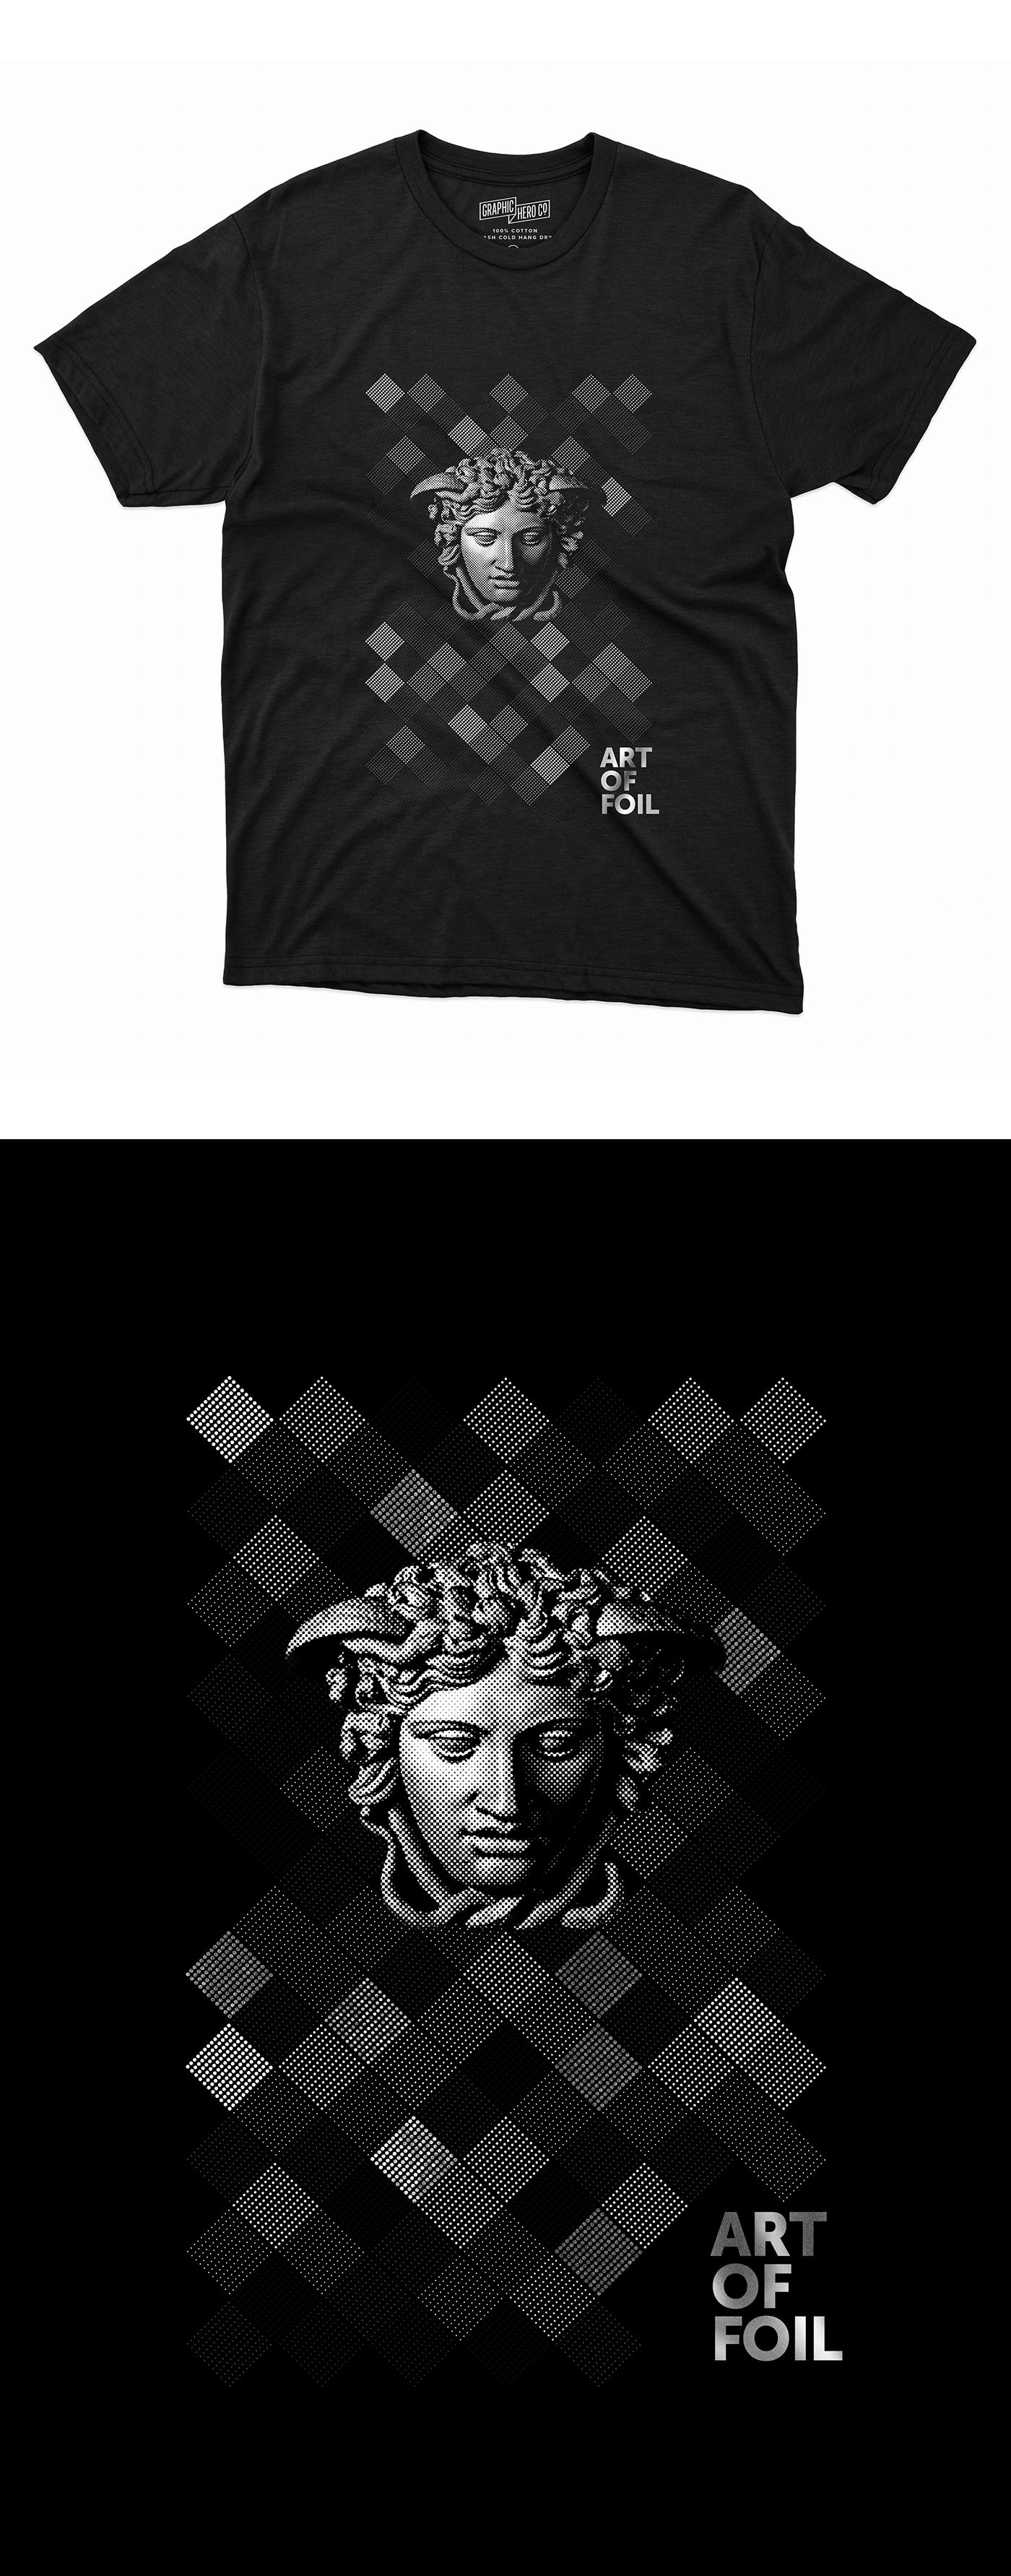 Разработать принт для футболки фото f_3685f5ff494078f3.jpg